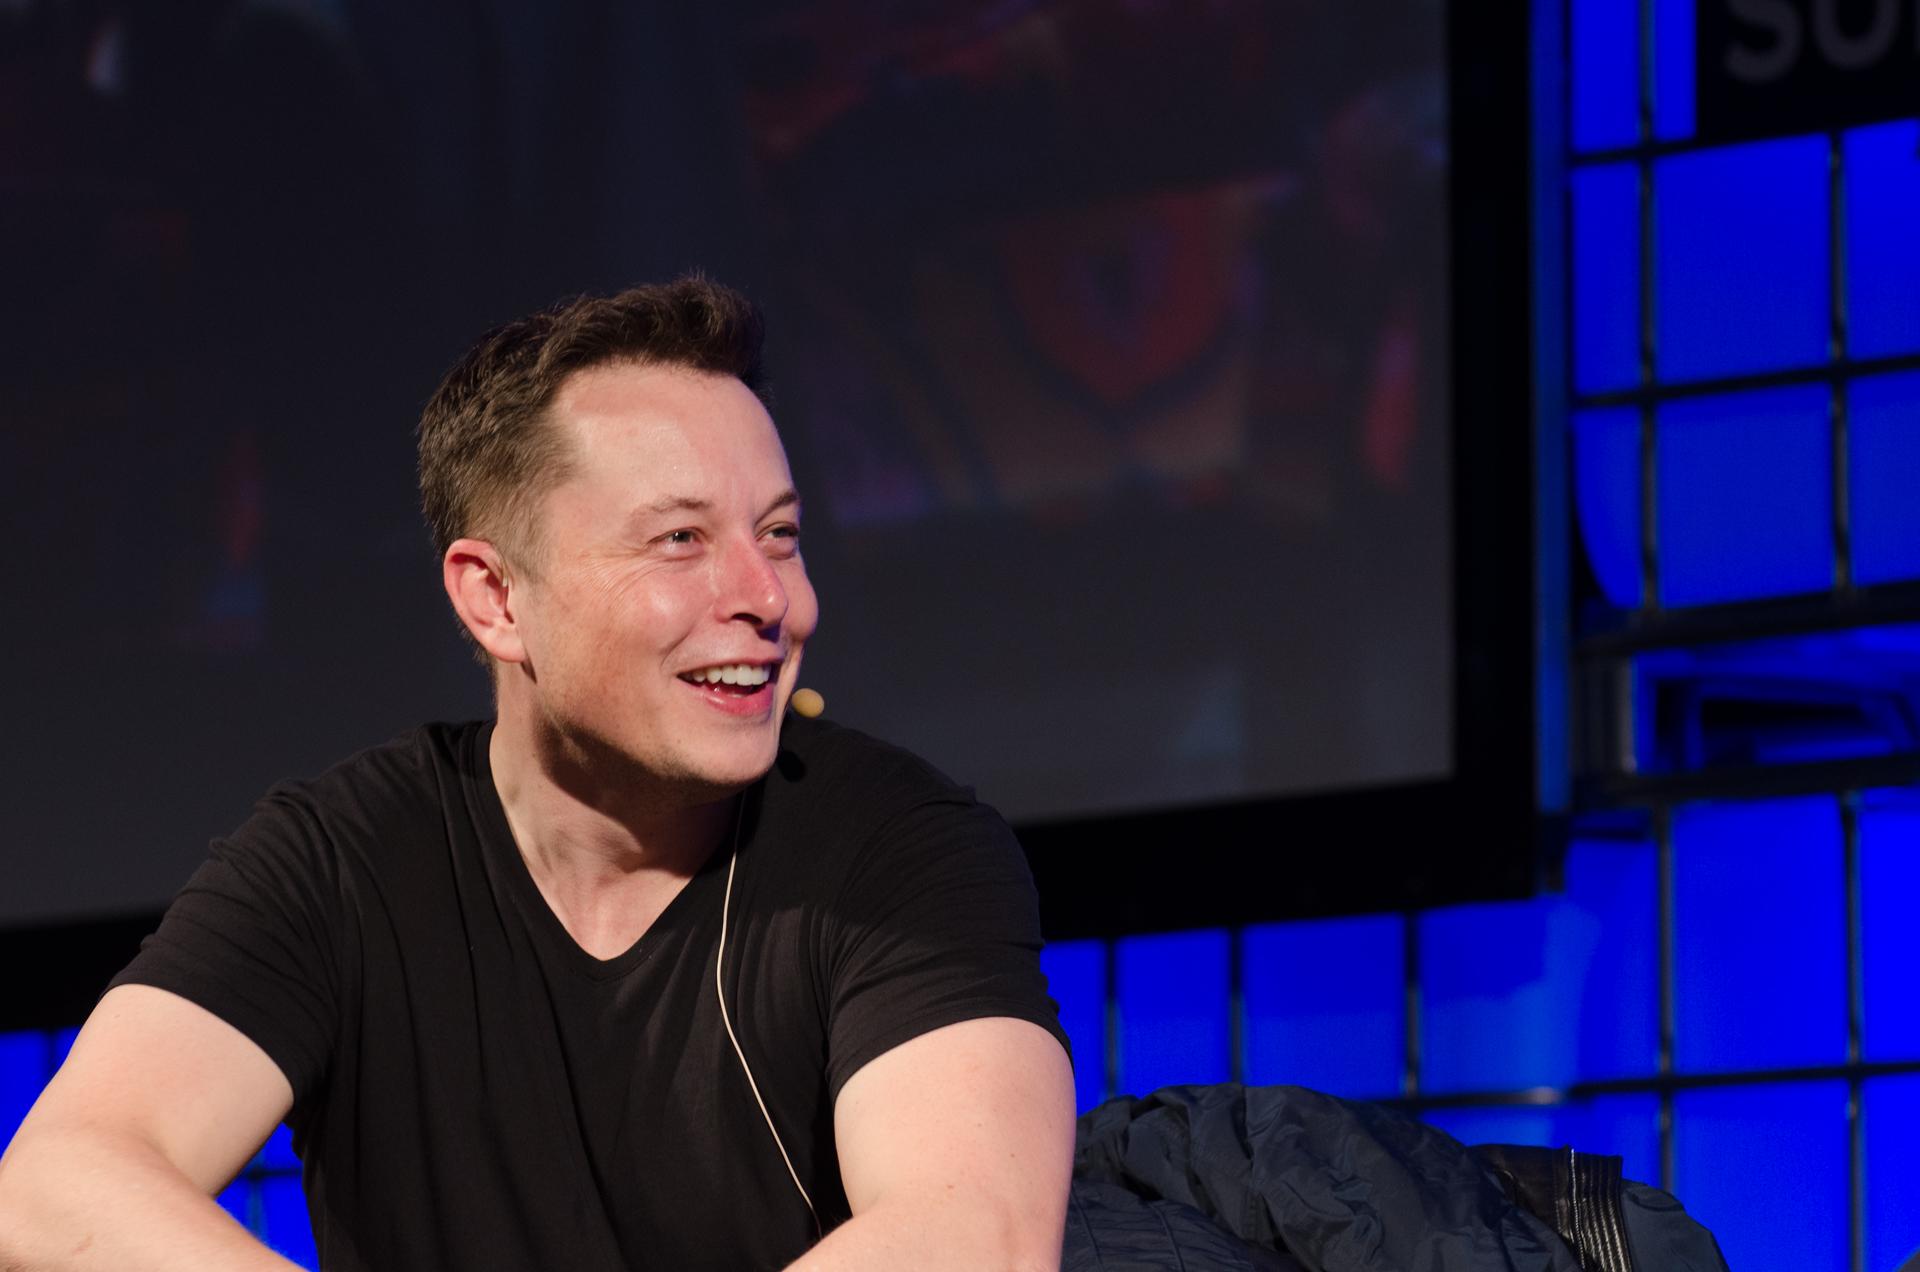 Elon Musk speaking at The Summit 2013. Photo credit: Heisenberg Media, Flickr.